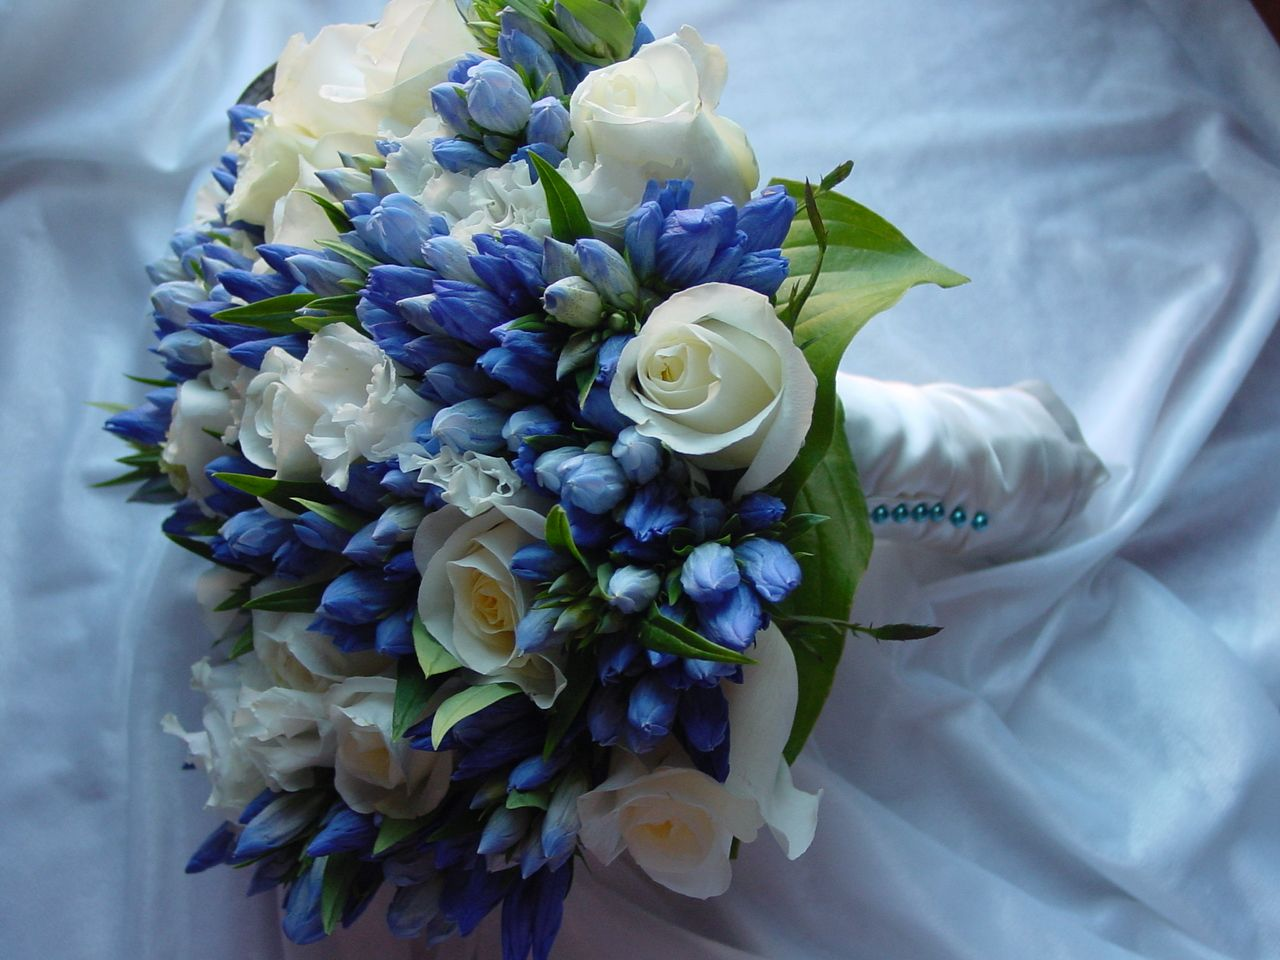 Blue wedding bouquets ideas inspirations bridal bouquets blue wedding bouquets ideas inspirations junglespirit Choice Image